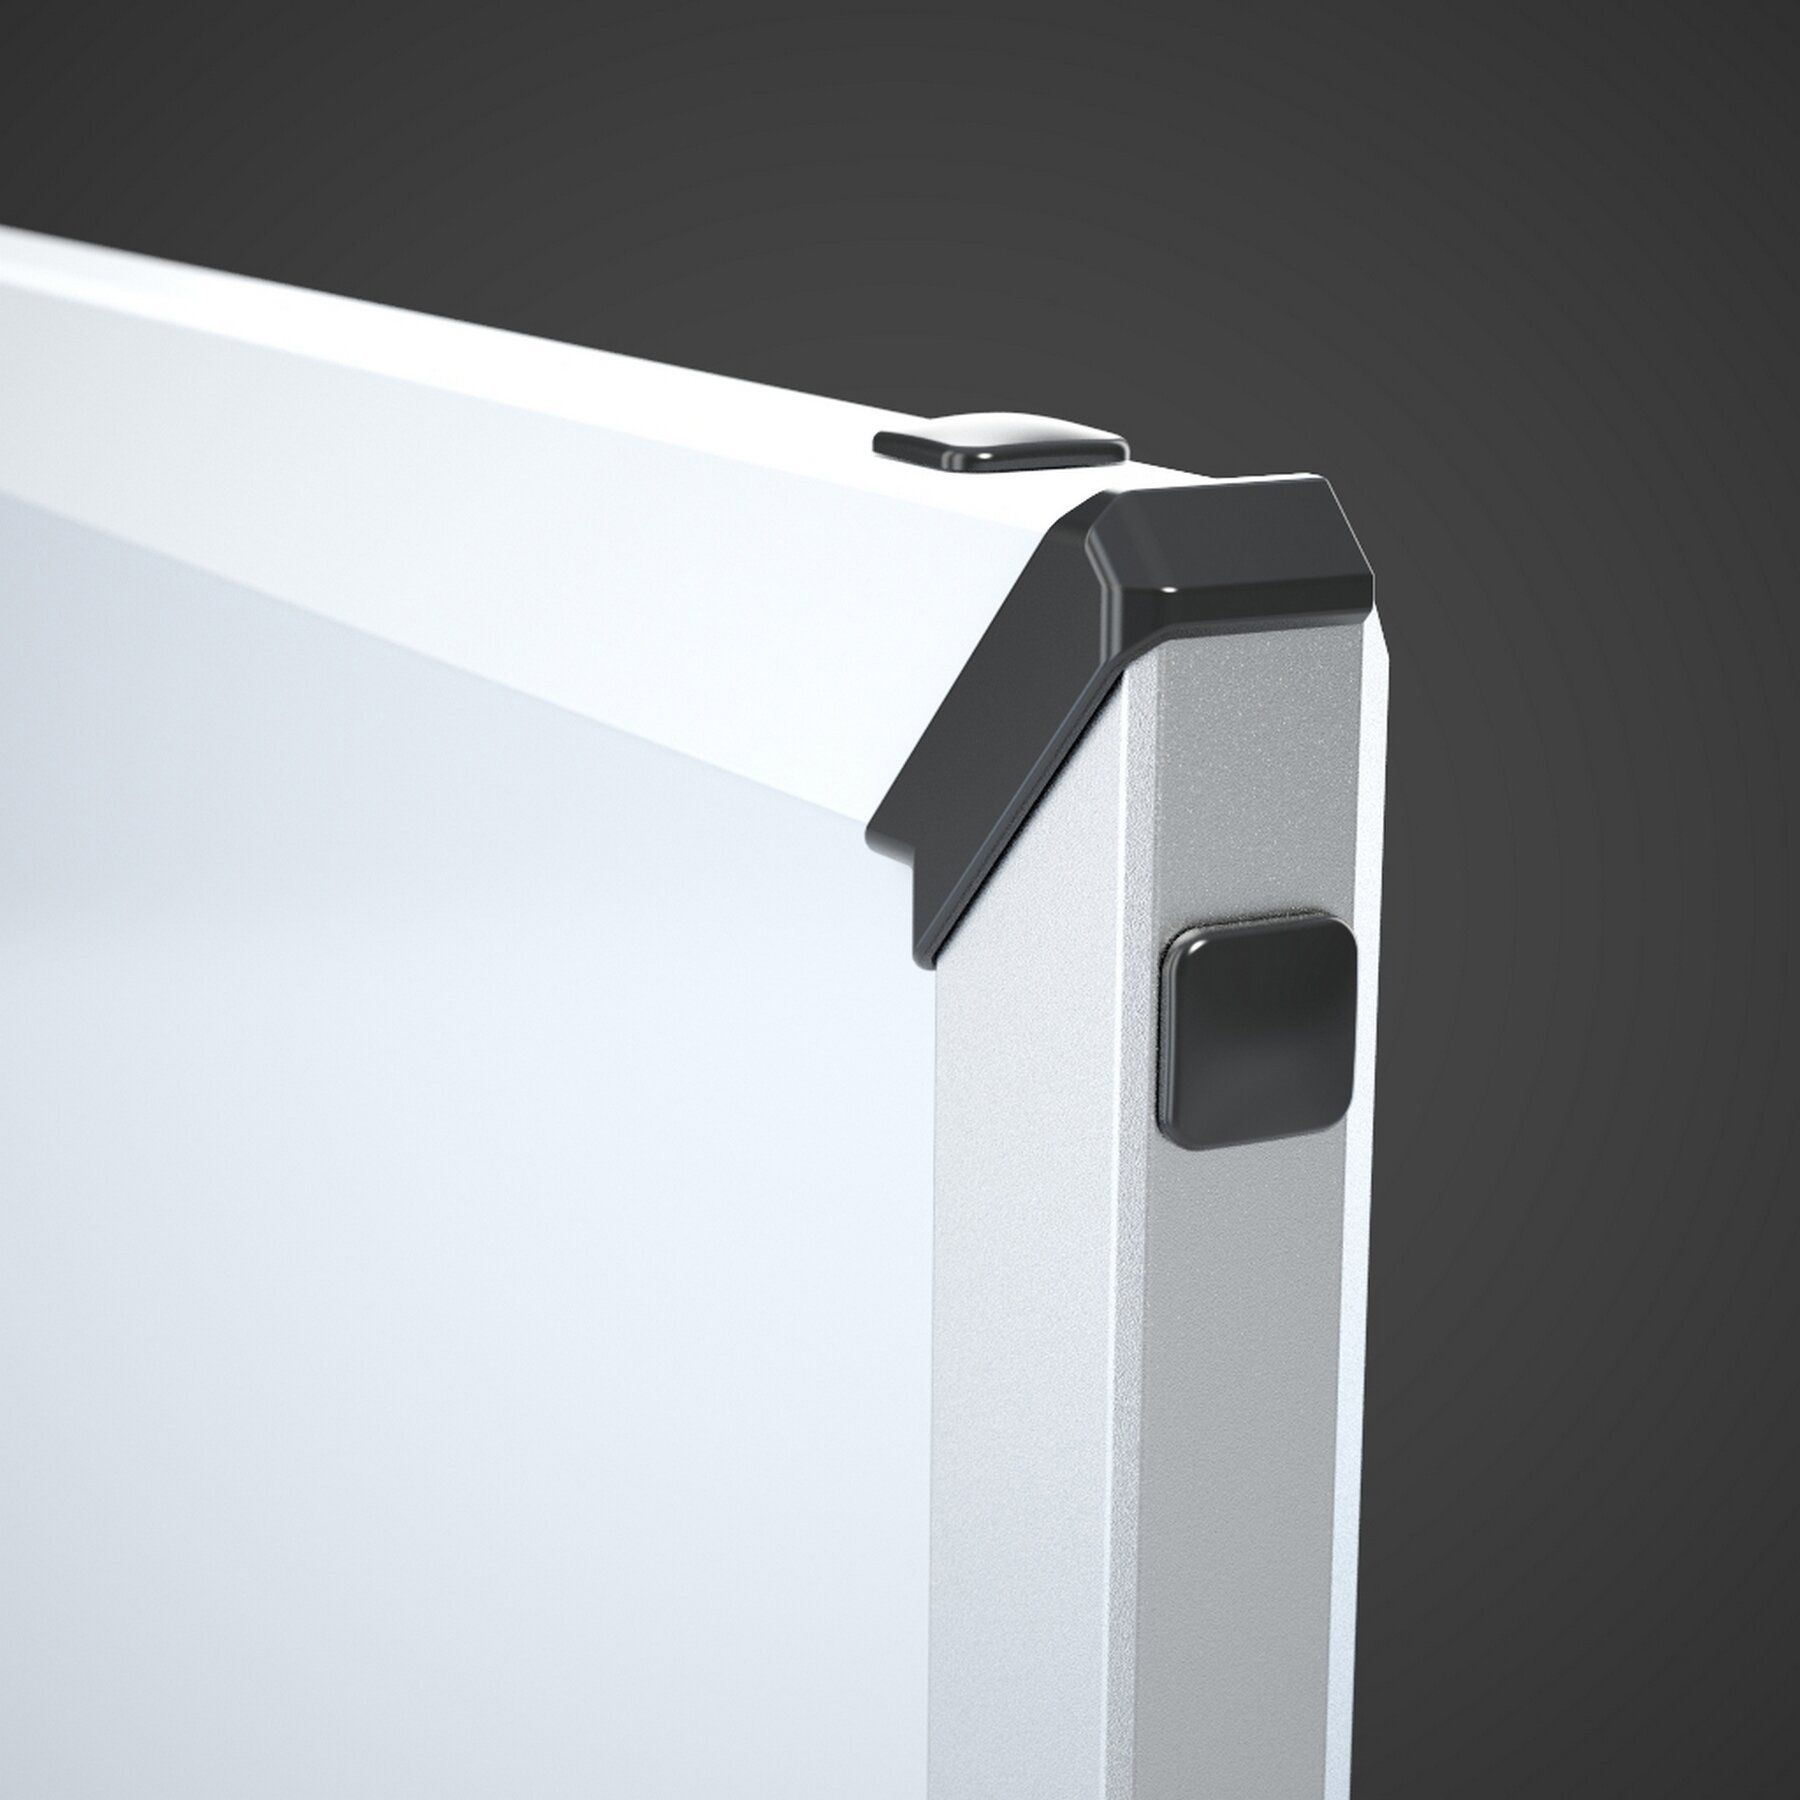 Доска белая магнитная сухостираемая StarBoard 100*150см., алюминиевая рамка, керамика 2x3 - фото 4